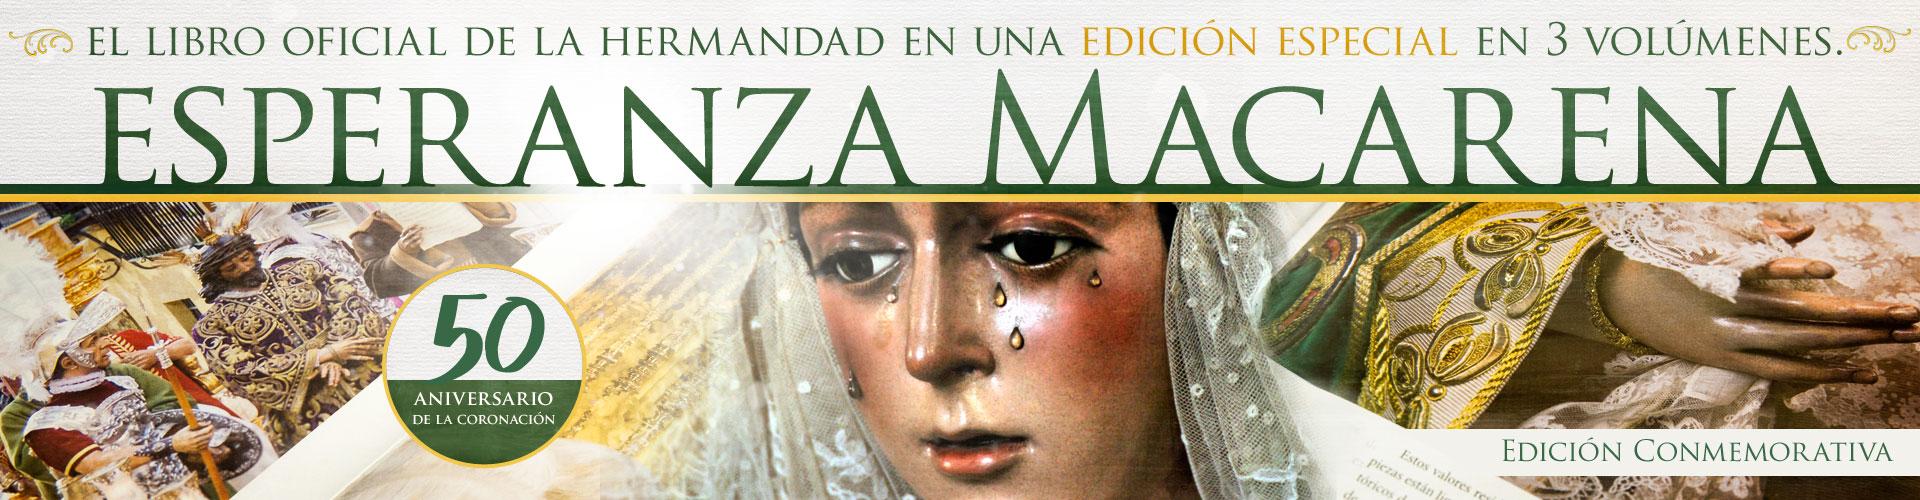 Esperanza Macarena : Libro Oficial de la Hermandad de la Macarena. Semana Santa de Sevilla. Ediciones Tartessos.